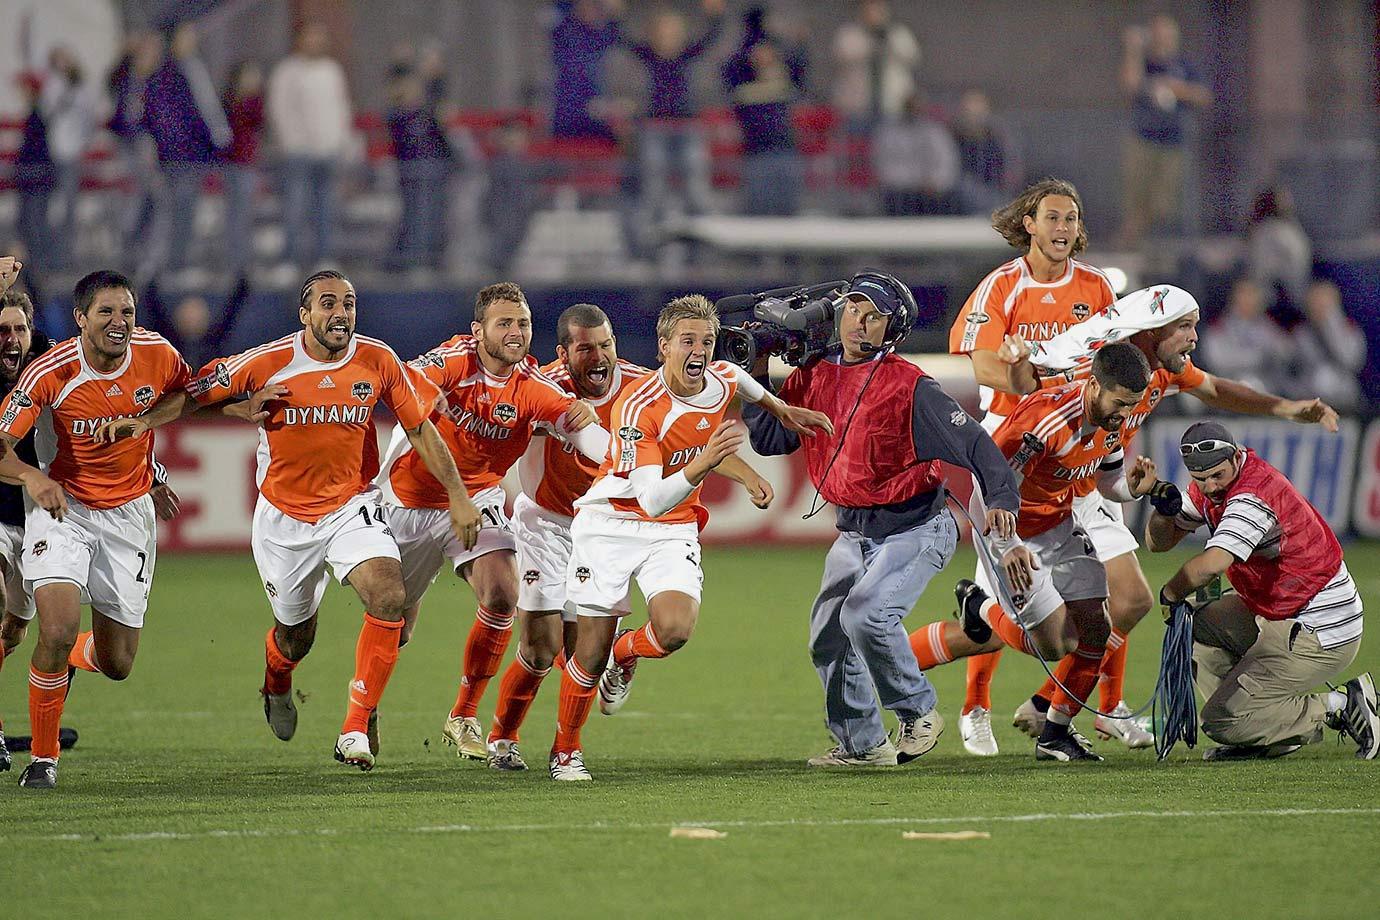 2006 — Houston Dynamo (beat New England Revolution in penalty kicks after 1-1 draw)